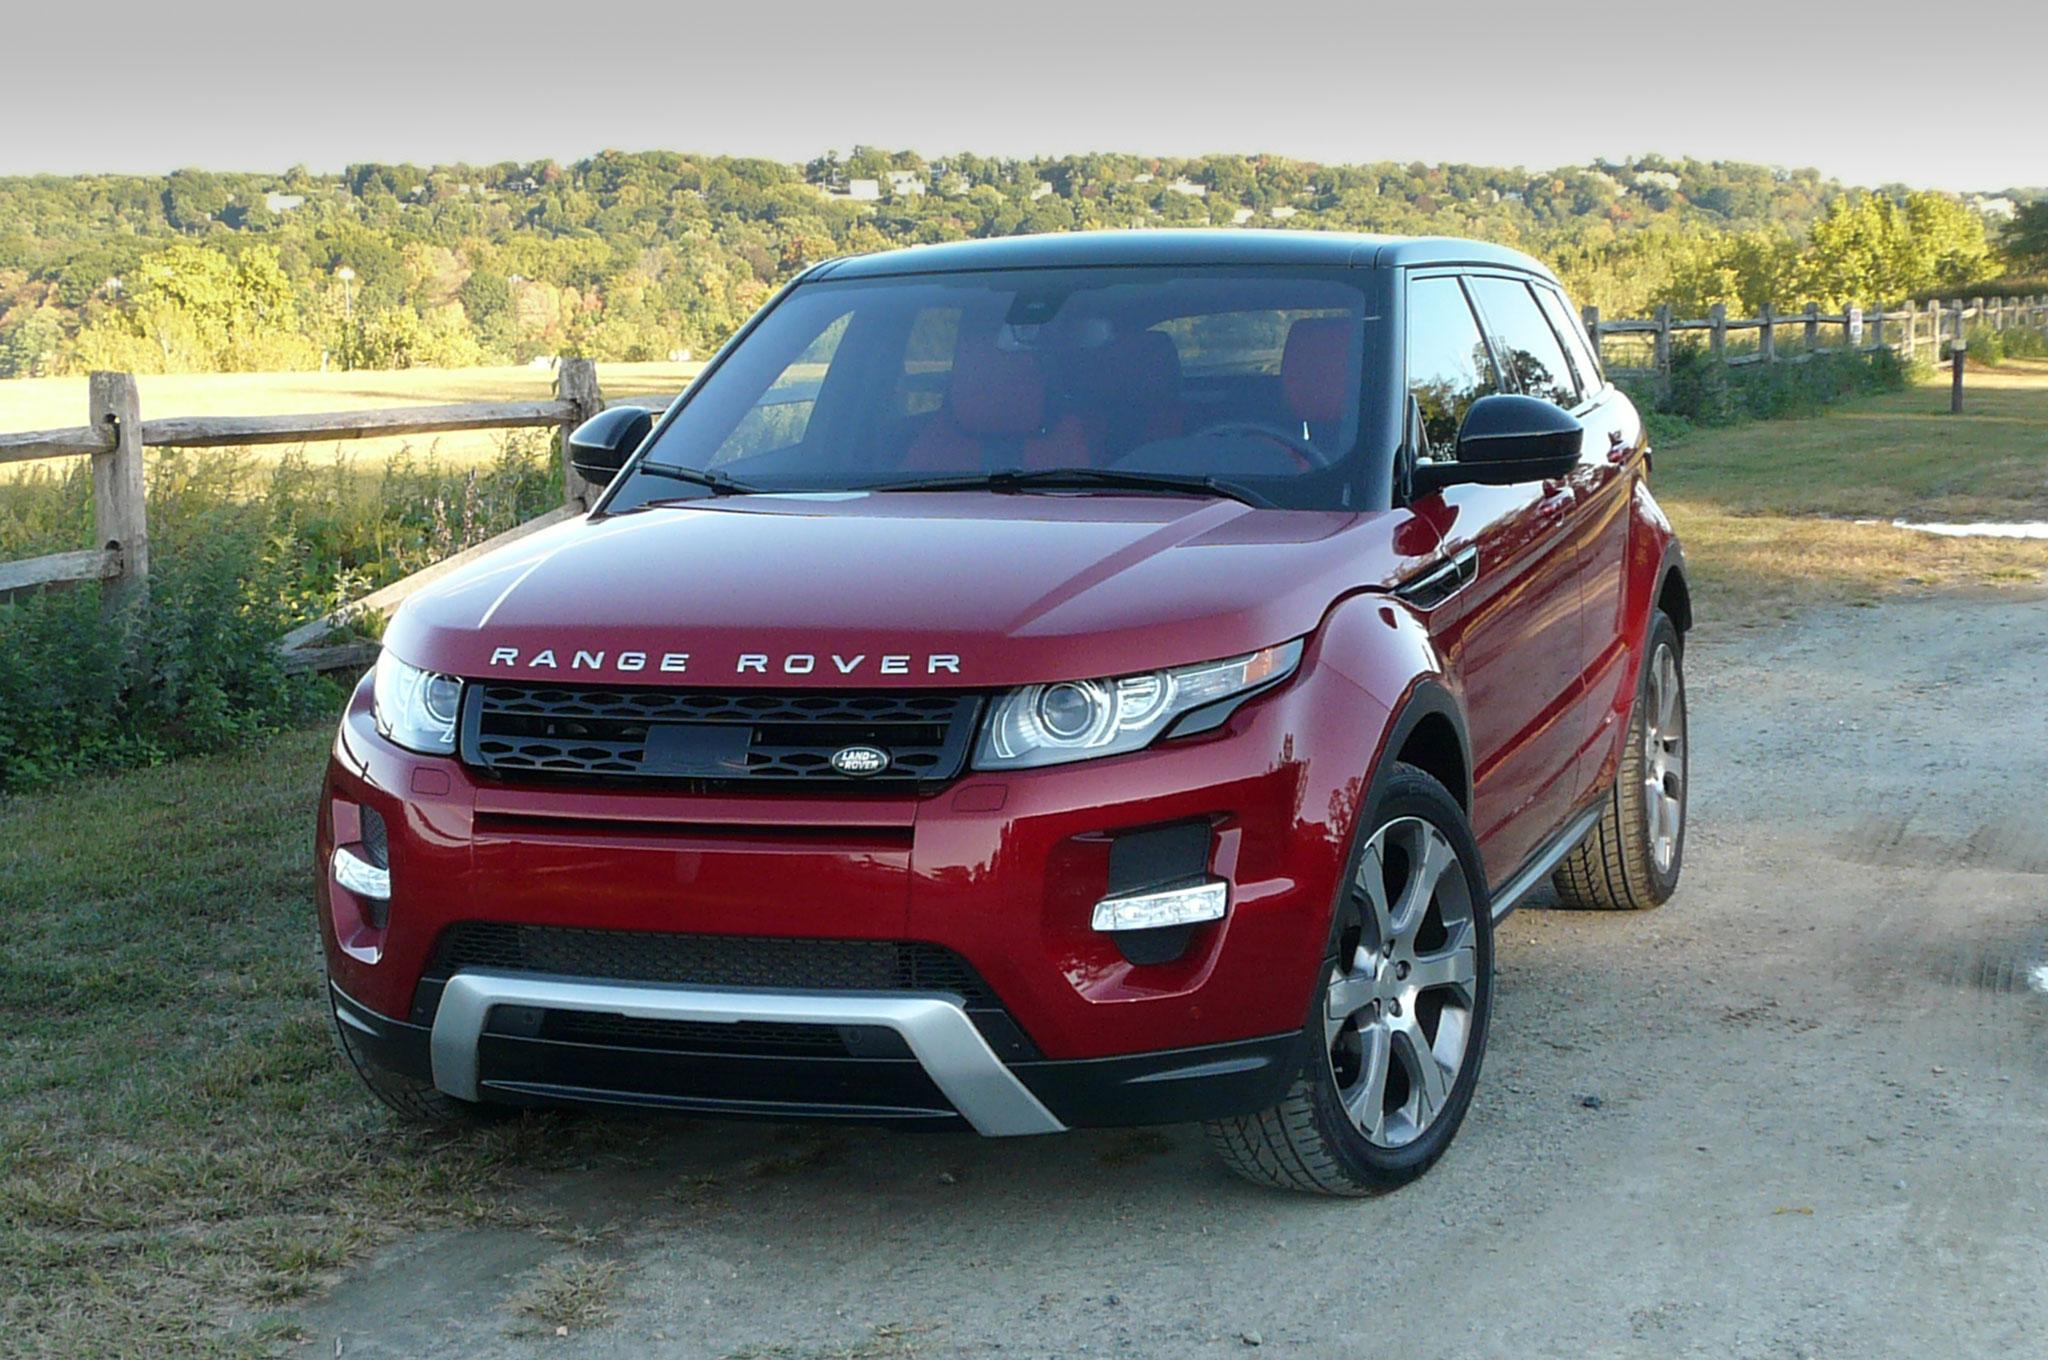 2014 Land Rover Range Rover Evoque Front Three Quarter View 3